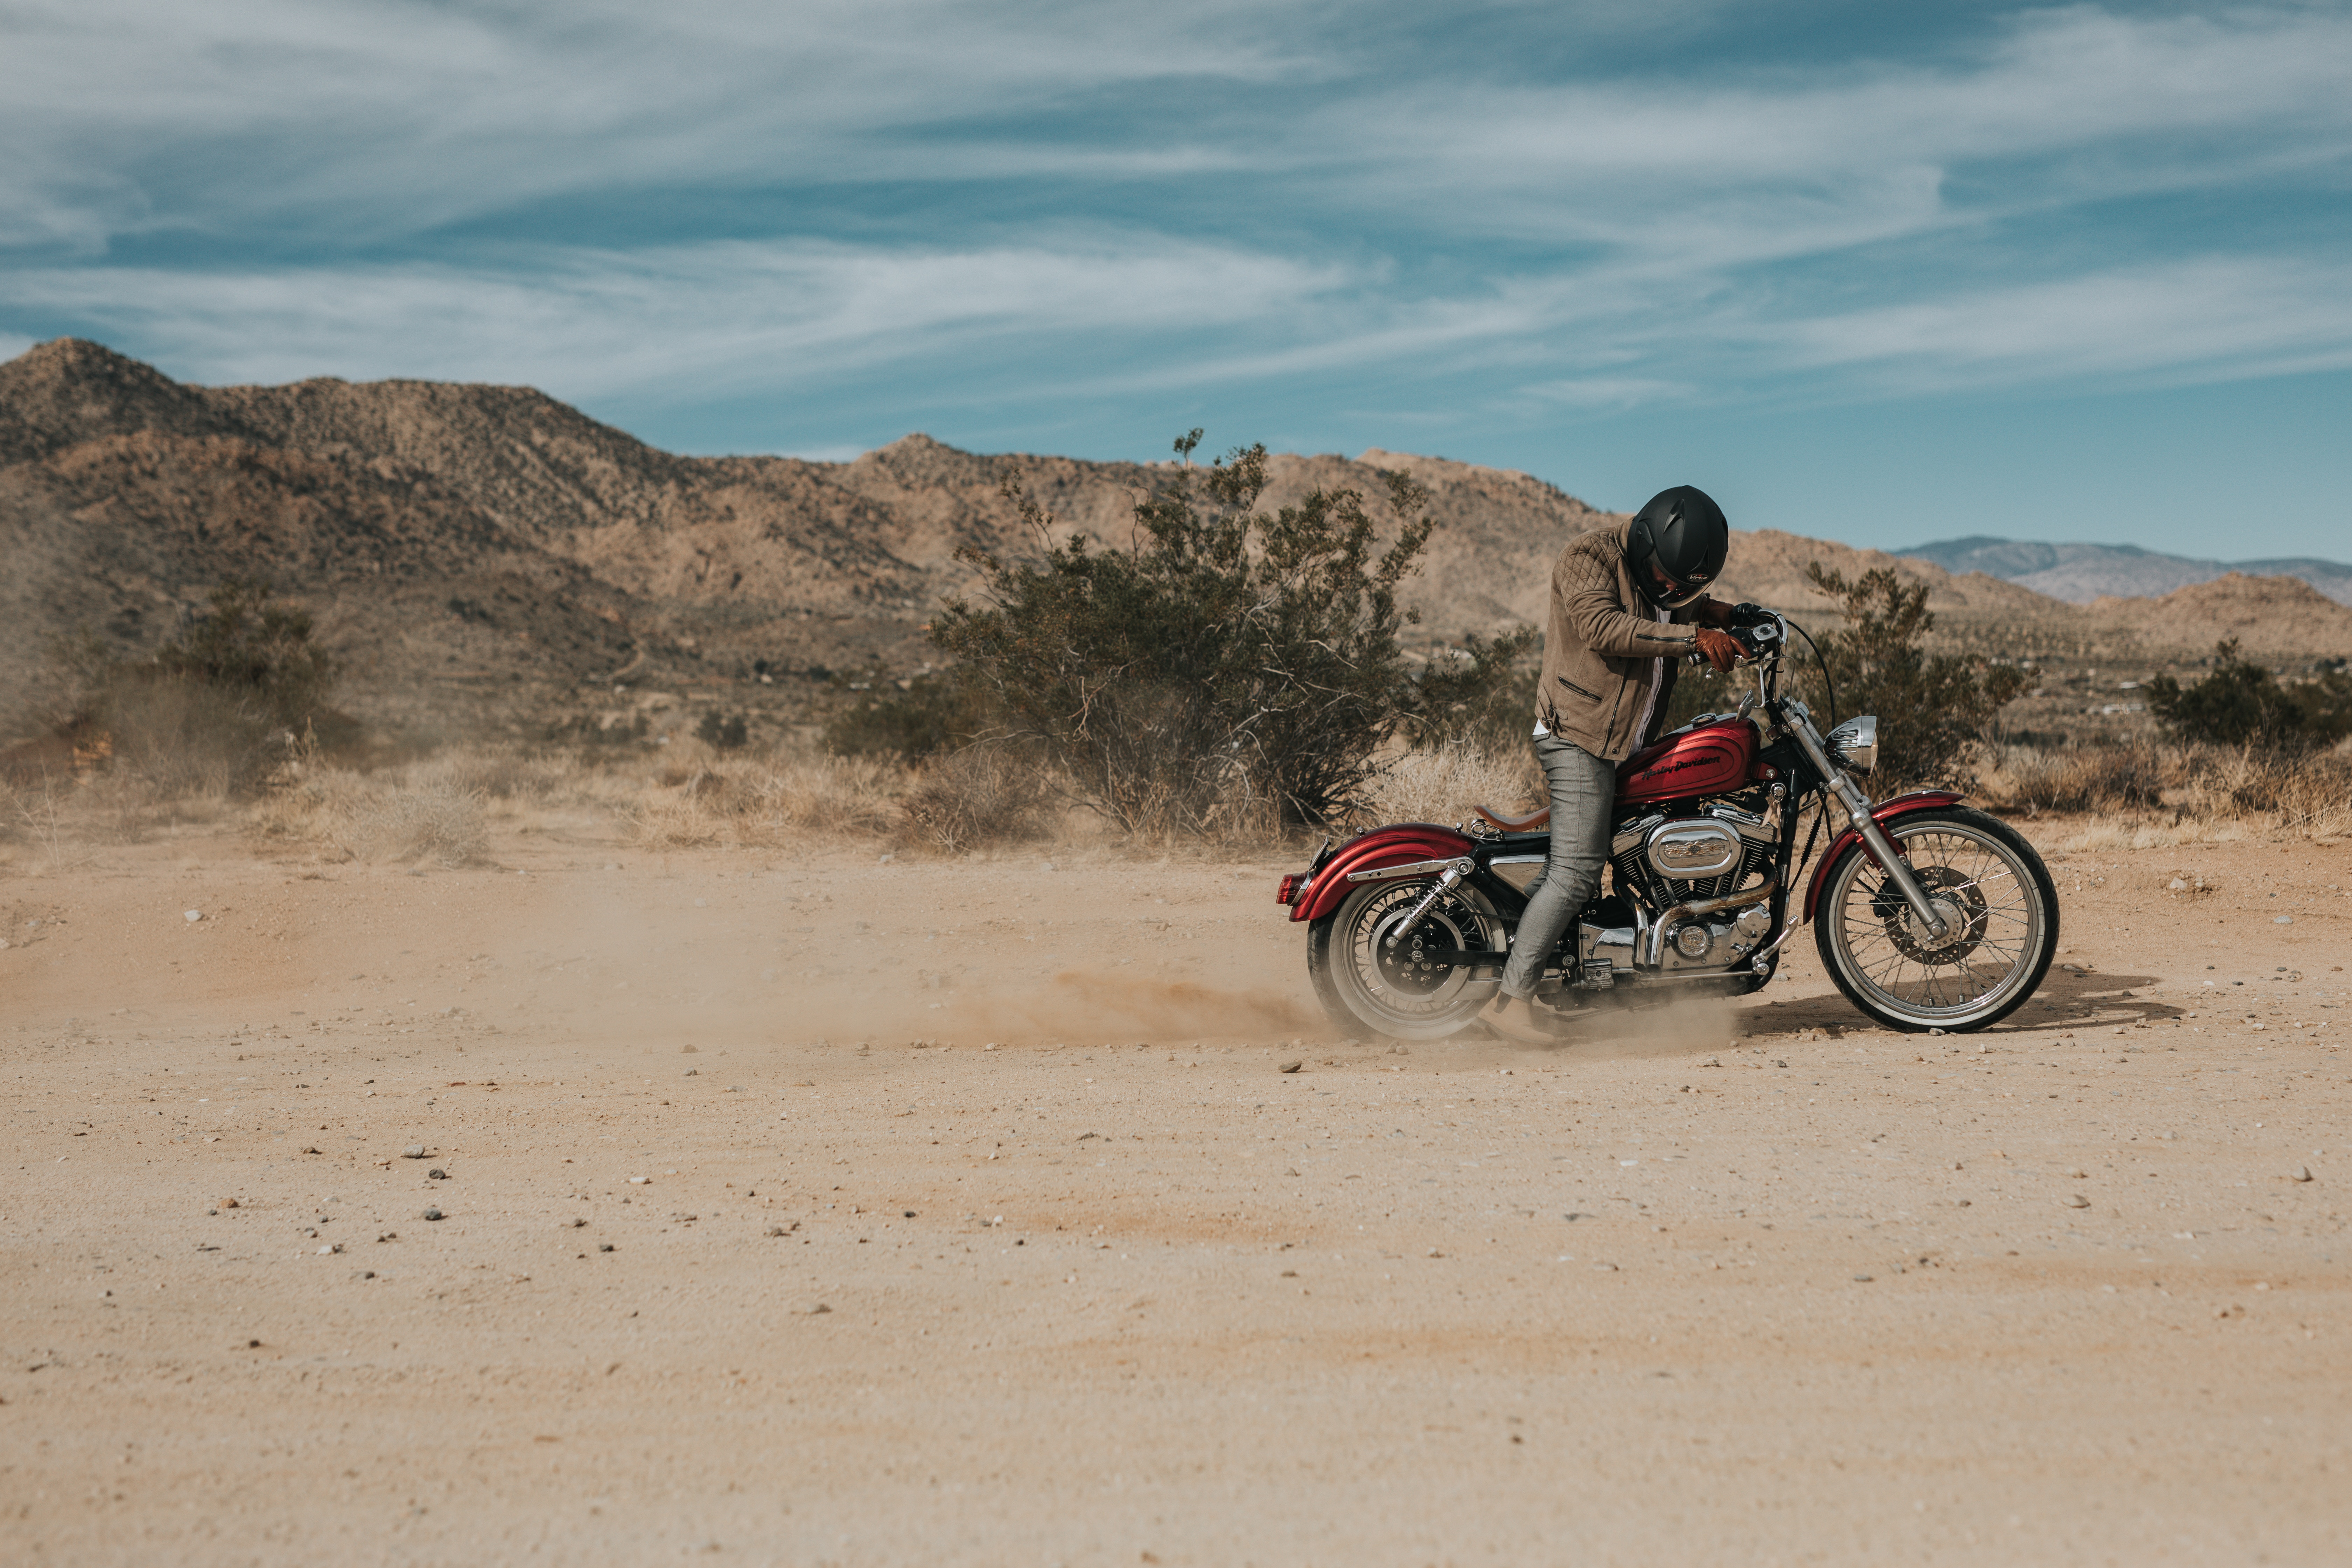 NEW FLAMING GAS TANK METAL BELT BUCKLE MOTORCYCLE BIKE BIKER FUEL FIRE